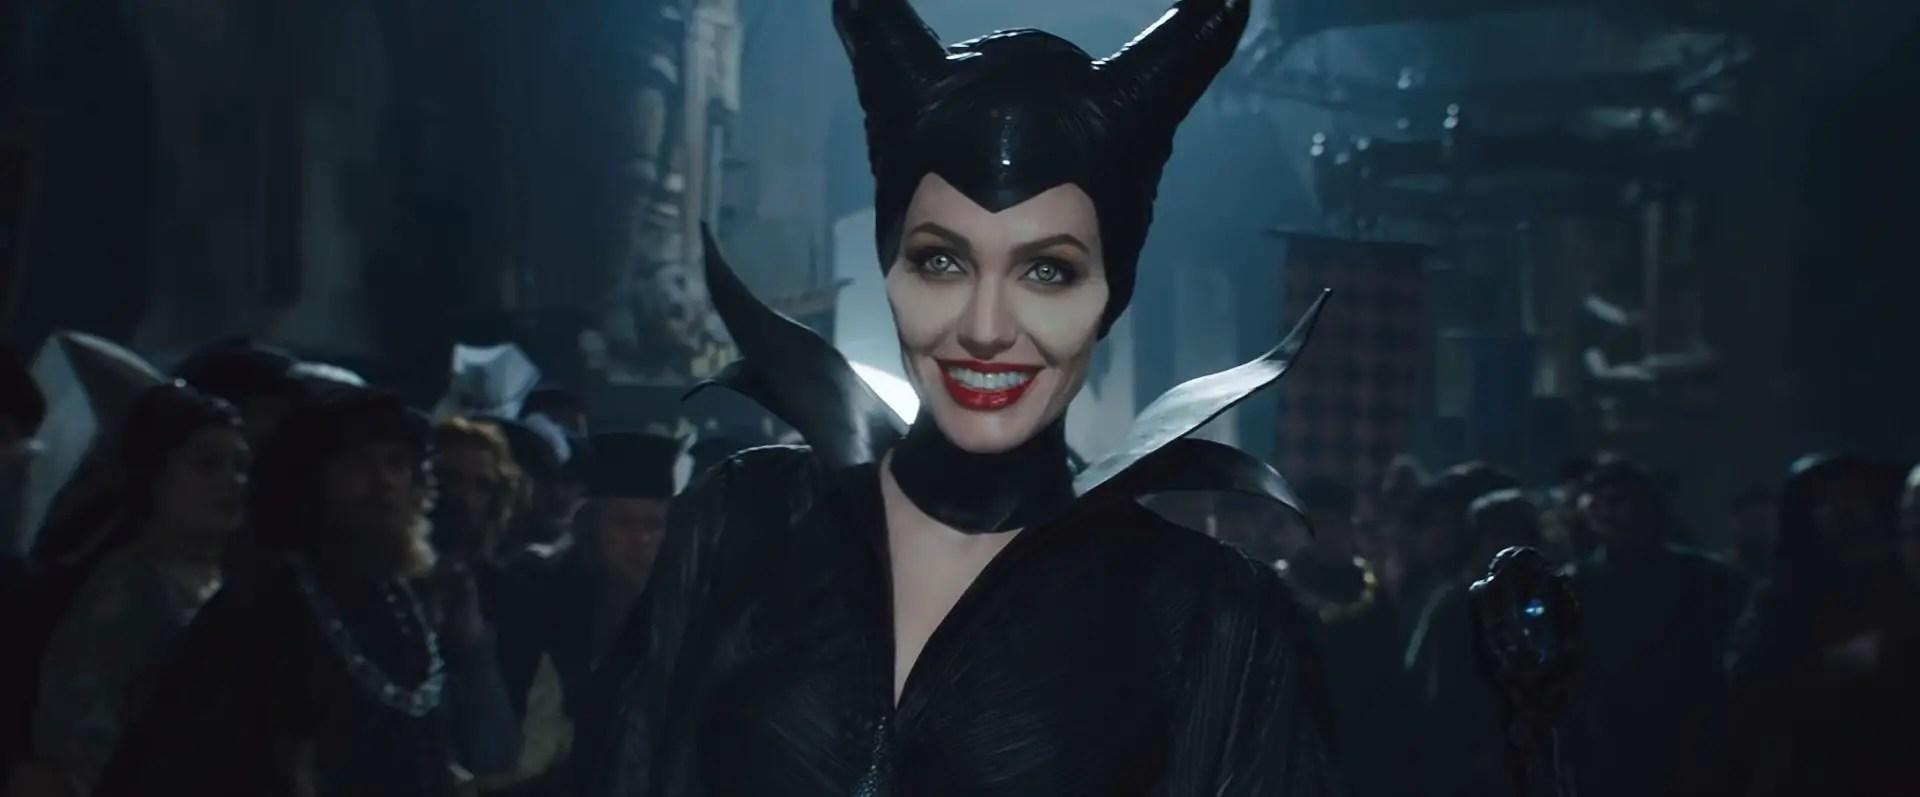 Maleficent Download  MadDownloadcom